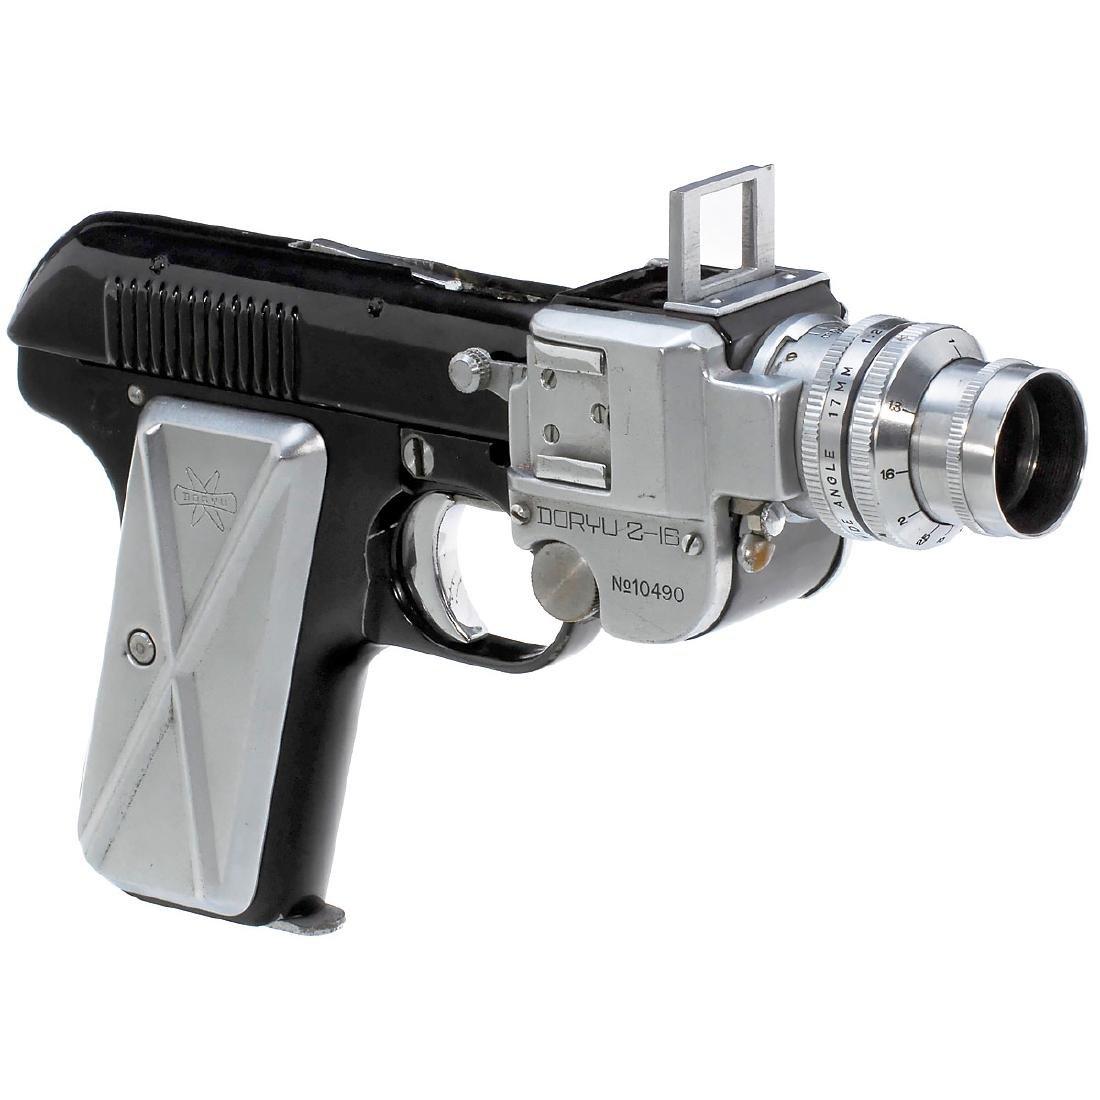 """Doryu 2-16 Flash Camera"", 1955"